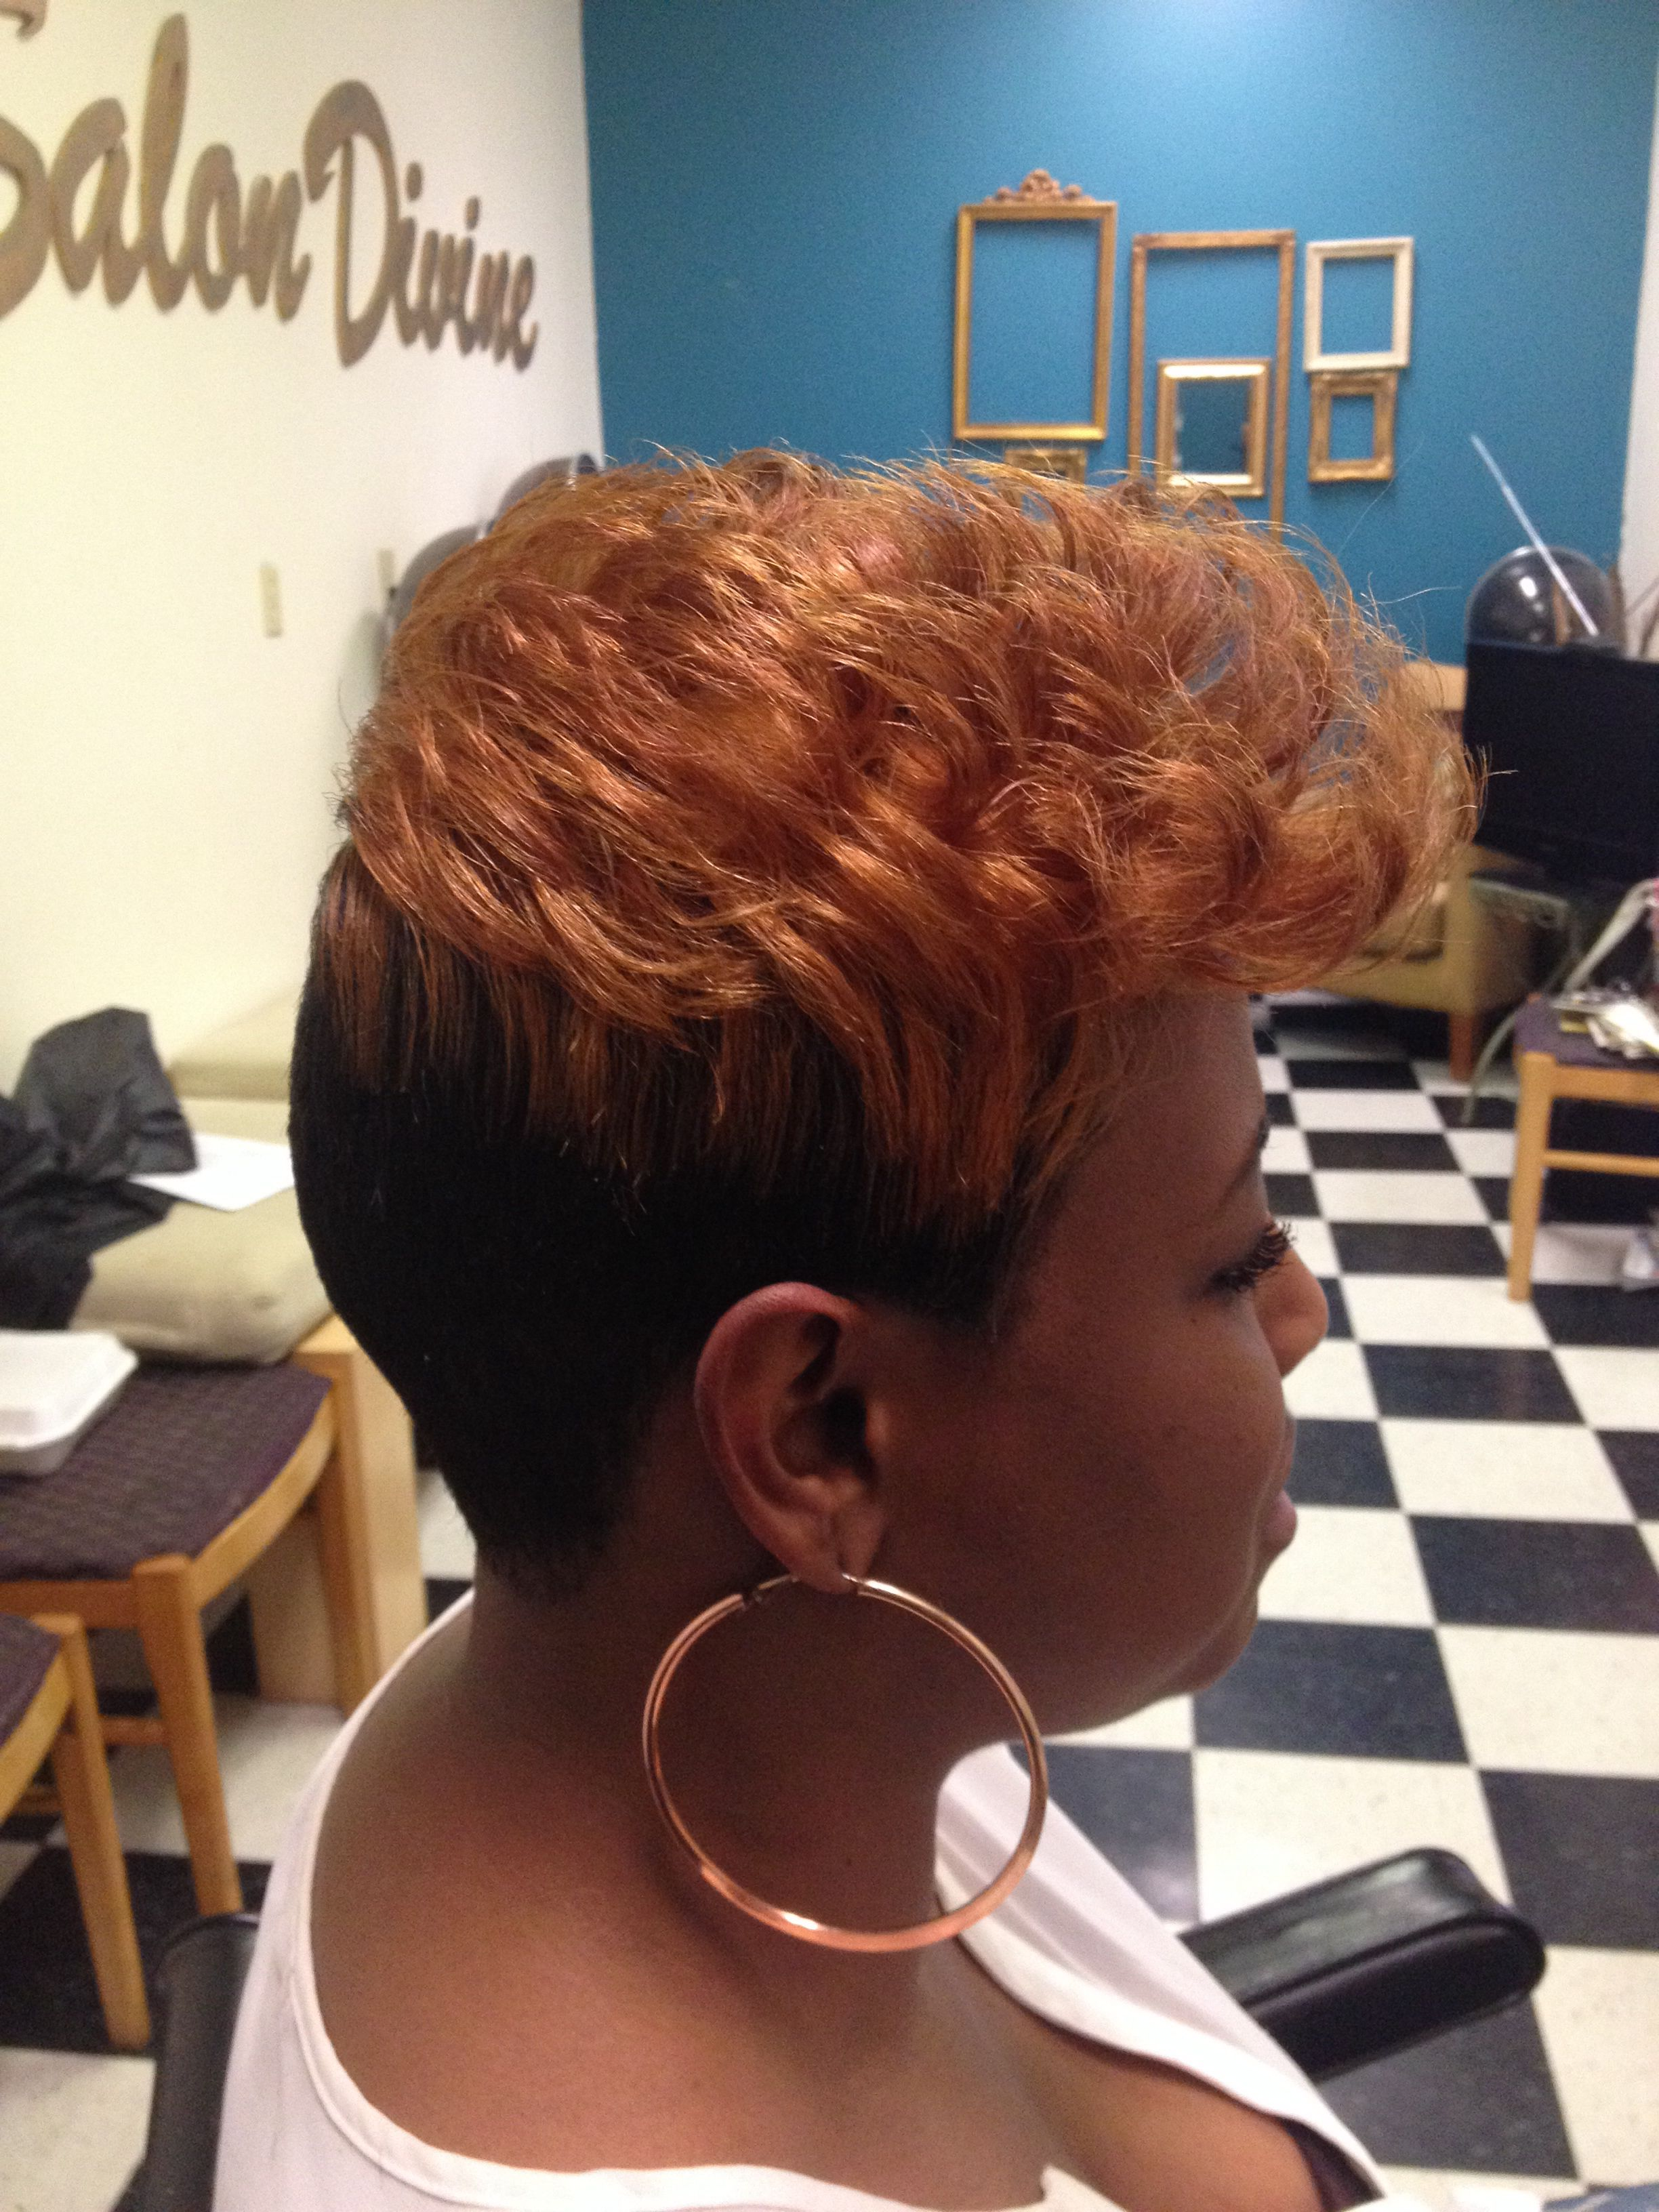 Short Hair Stylist Memphis Tn hairstylegalleries.com